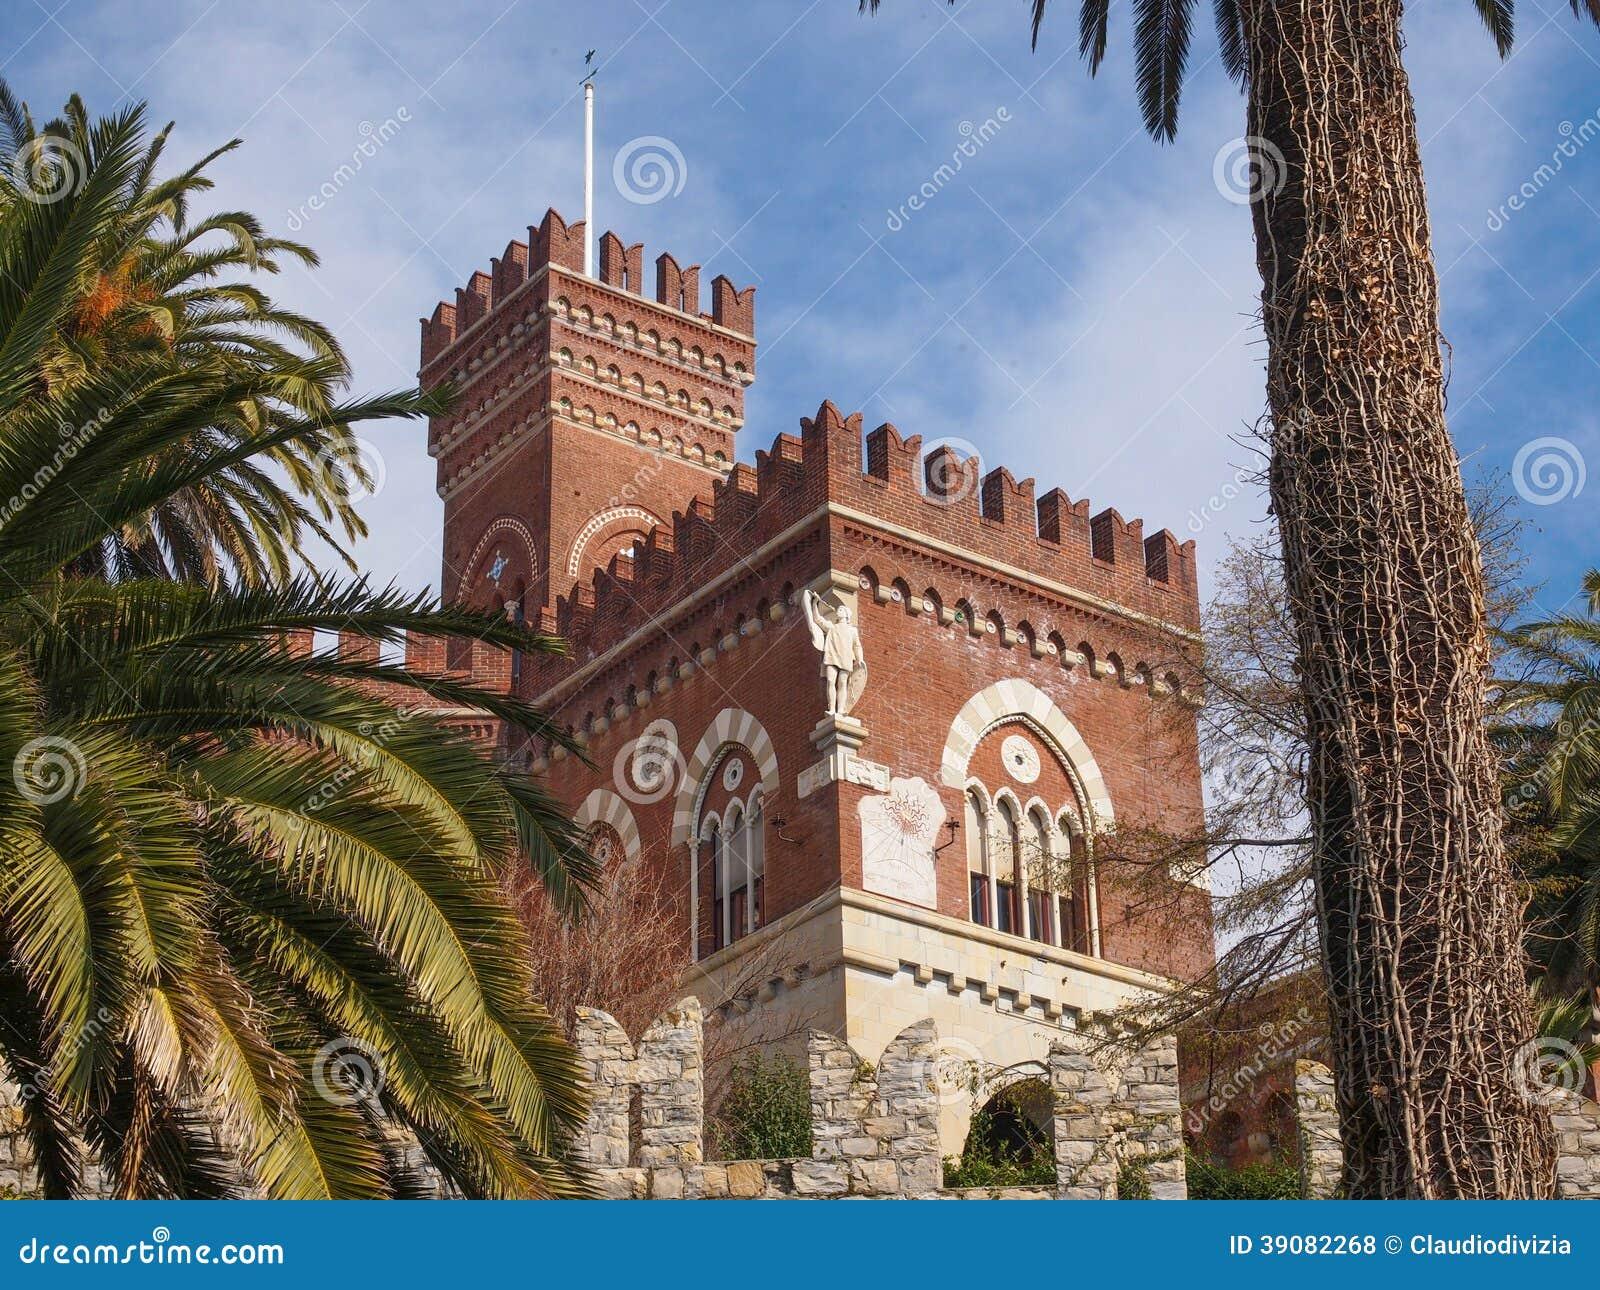 Castello D Albertis Gothic Revival Castle In Genoa Italy